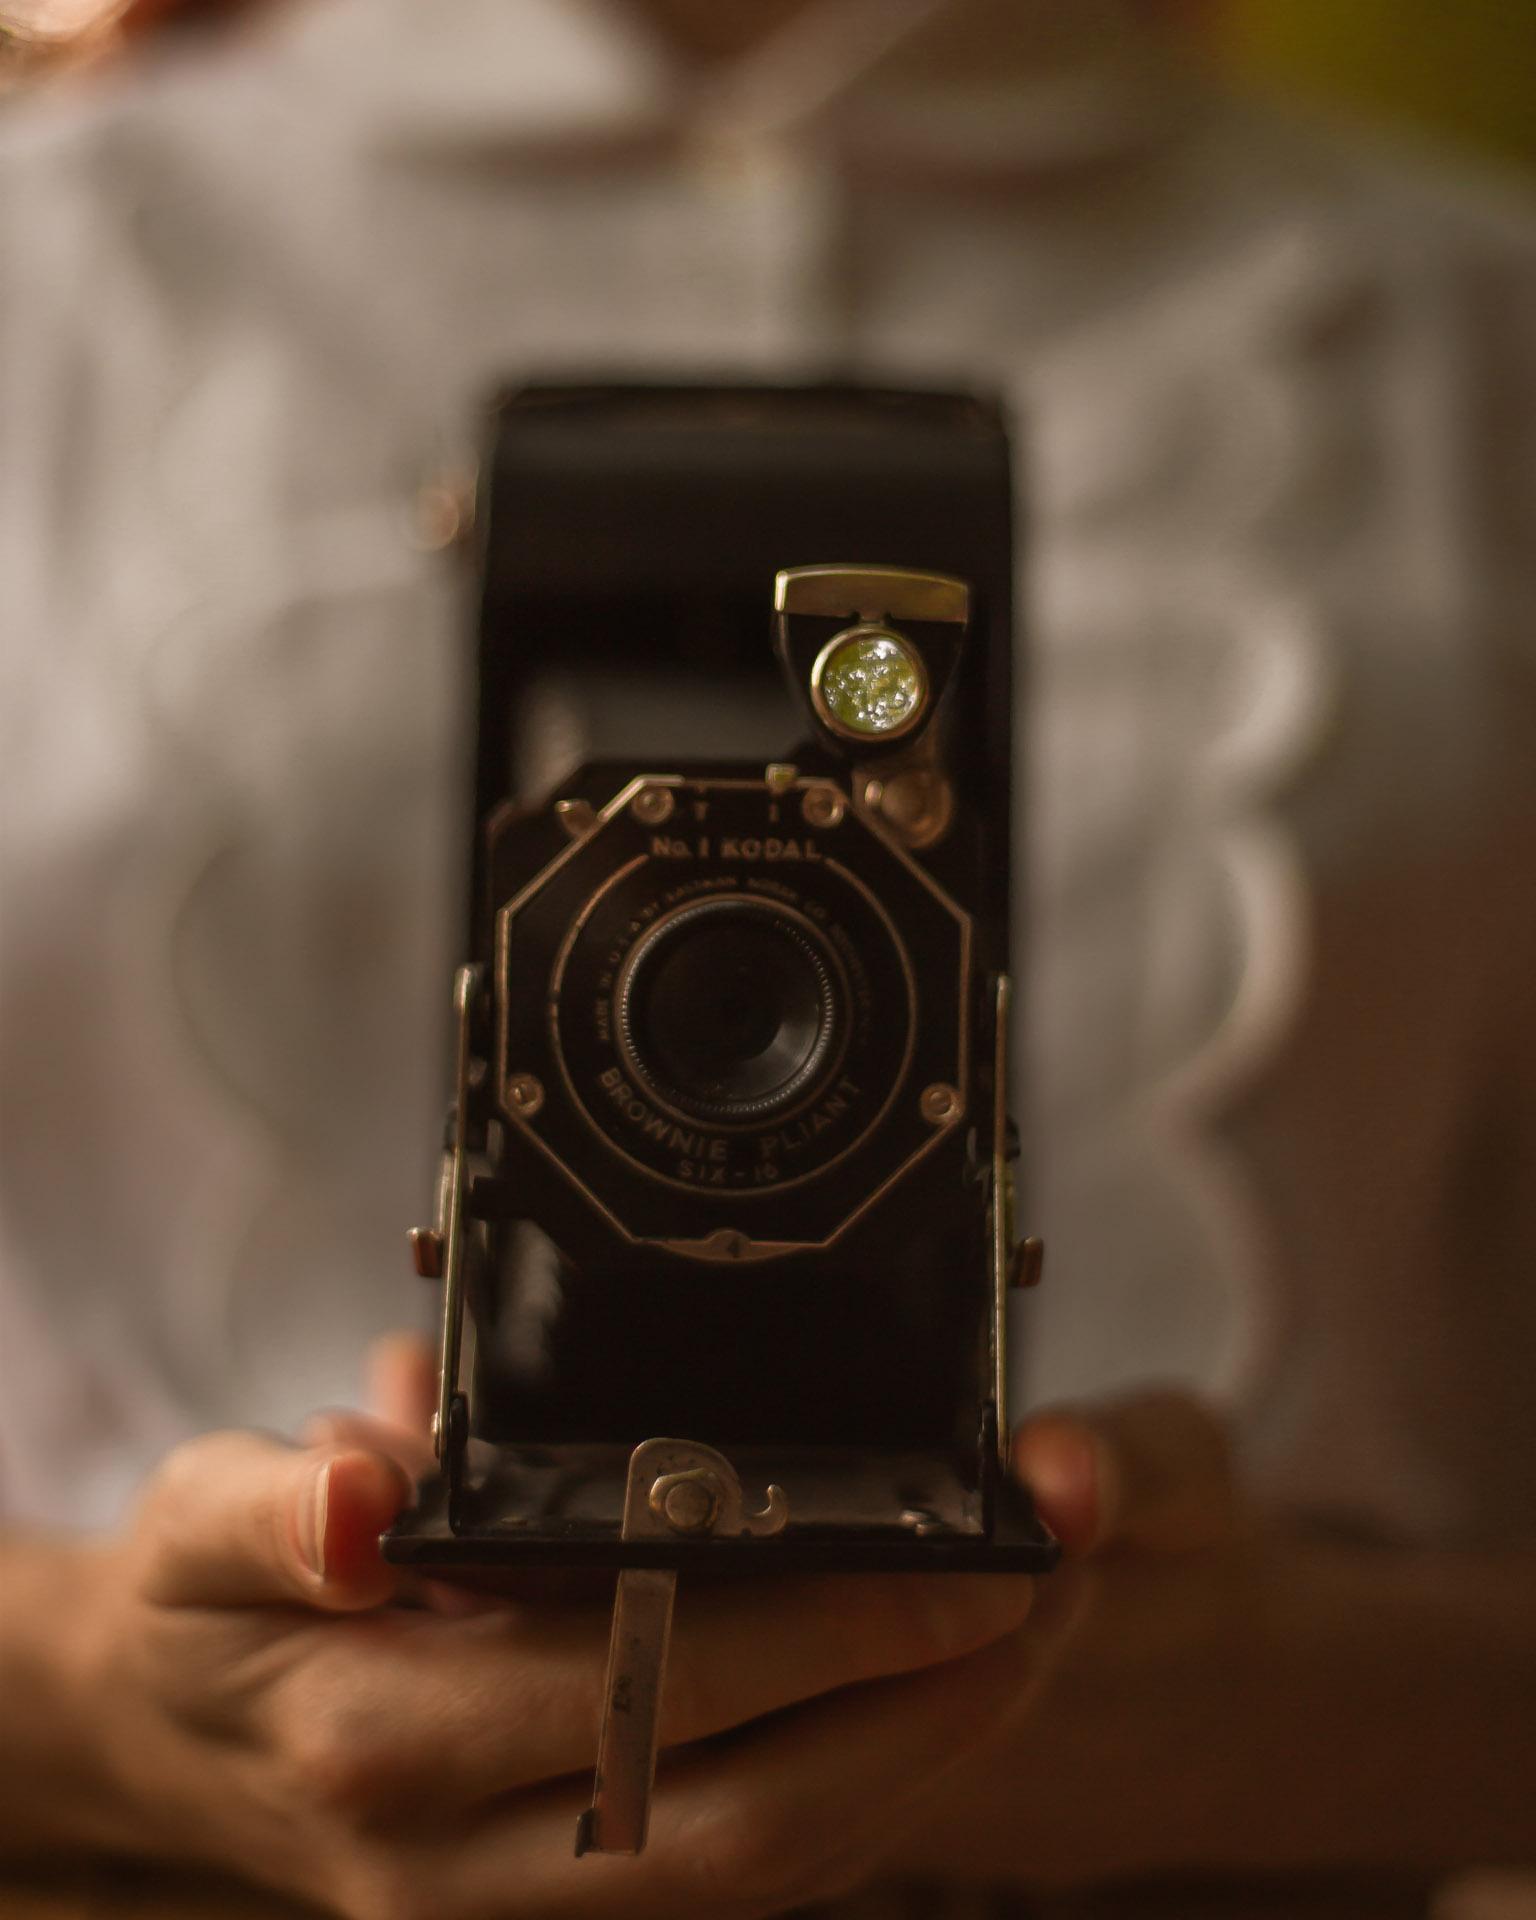 dettaglio macchina fotografica vintage dark academia